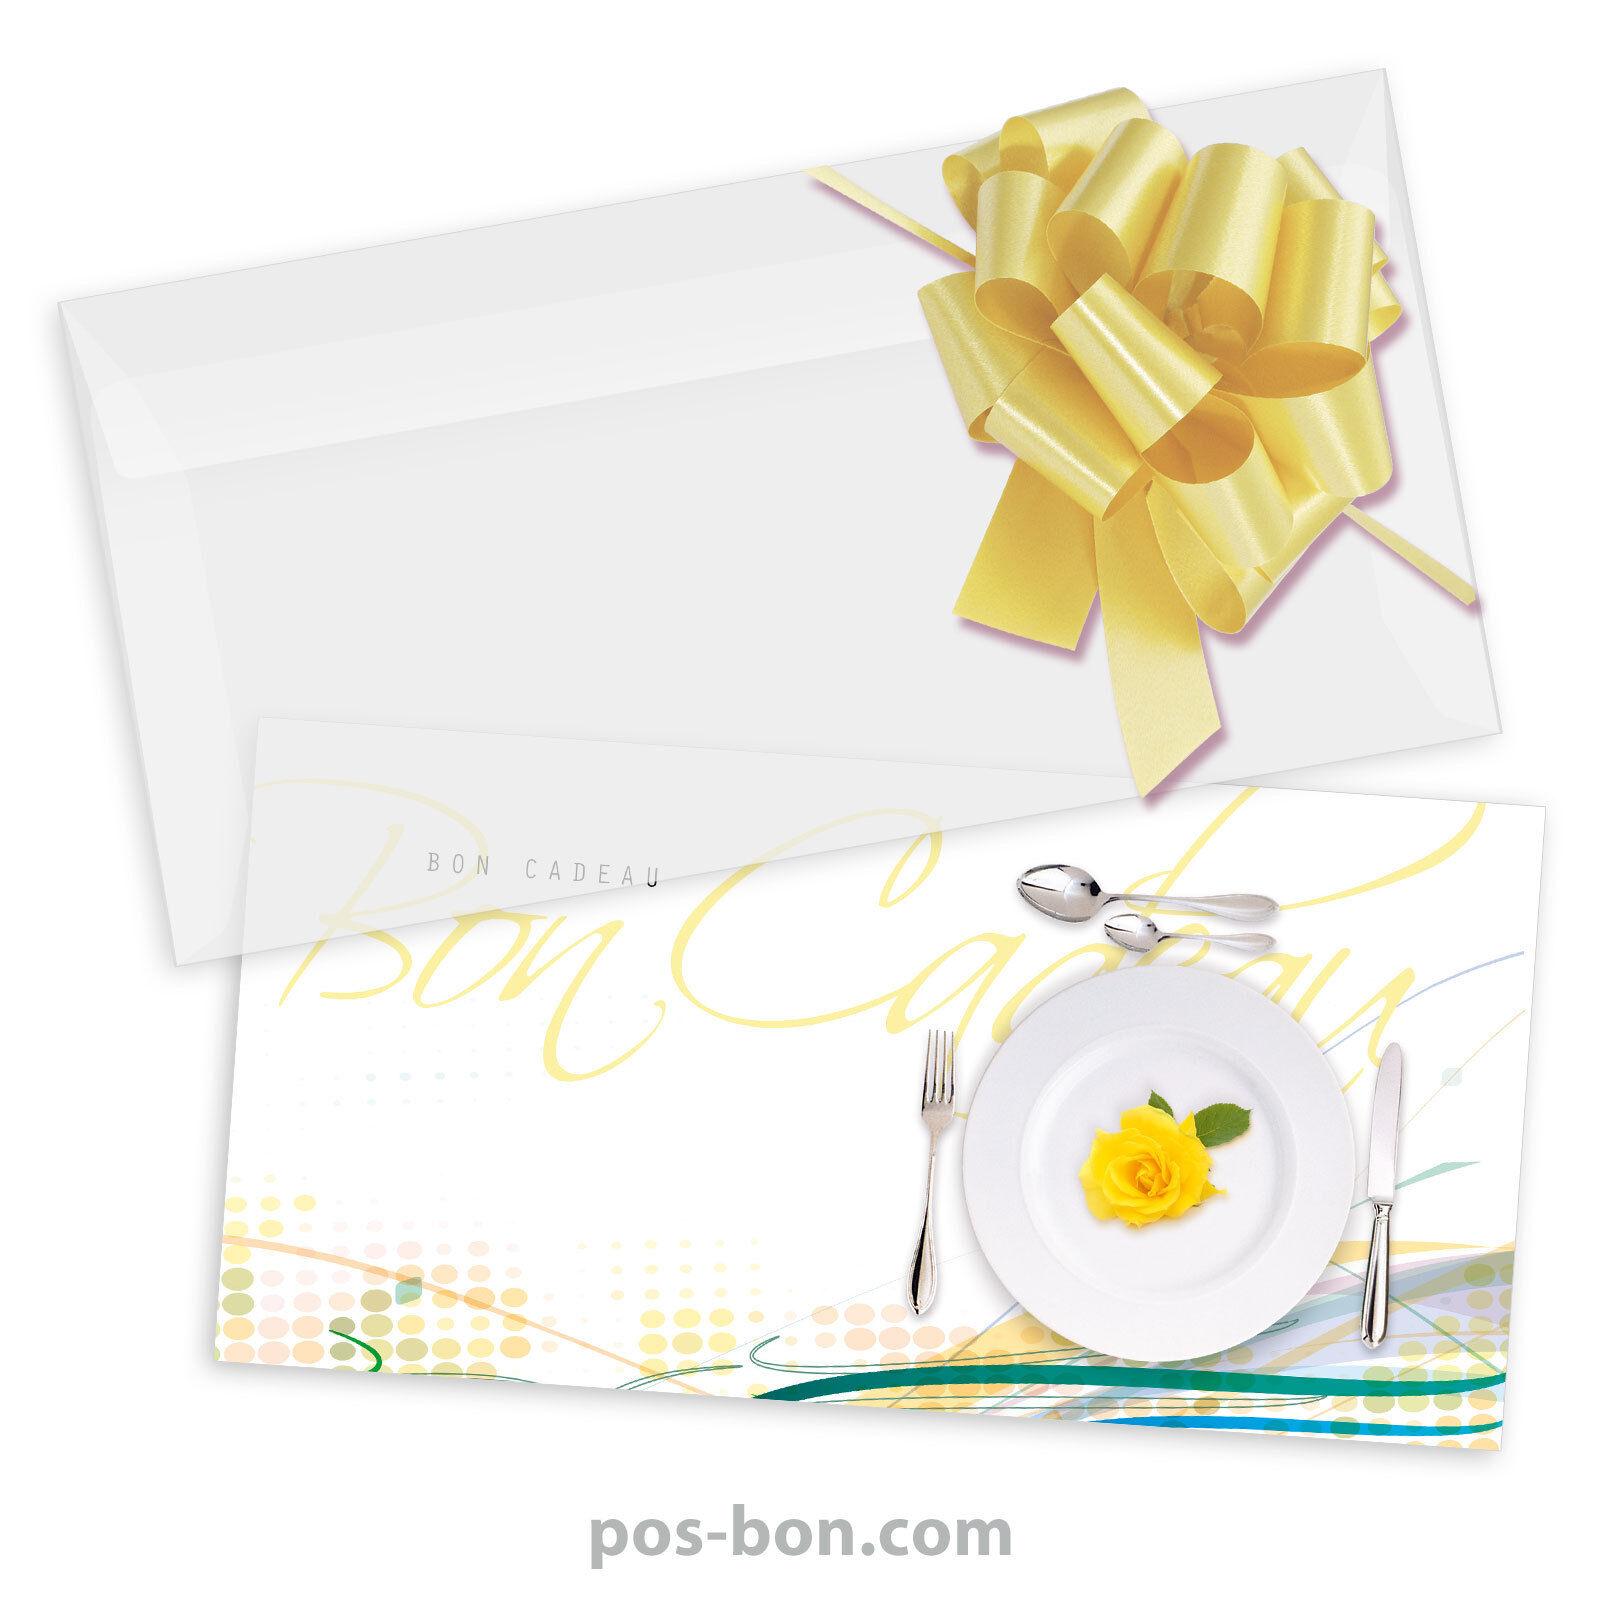 Bons cadeaux  enveloppes  nœuds rub. pour restaurants, gastronomie G92015F | Vollständige Spezifikation  | Ästhetisches Aussehen